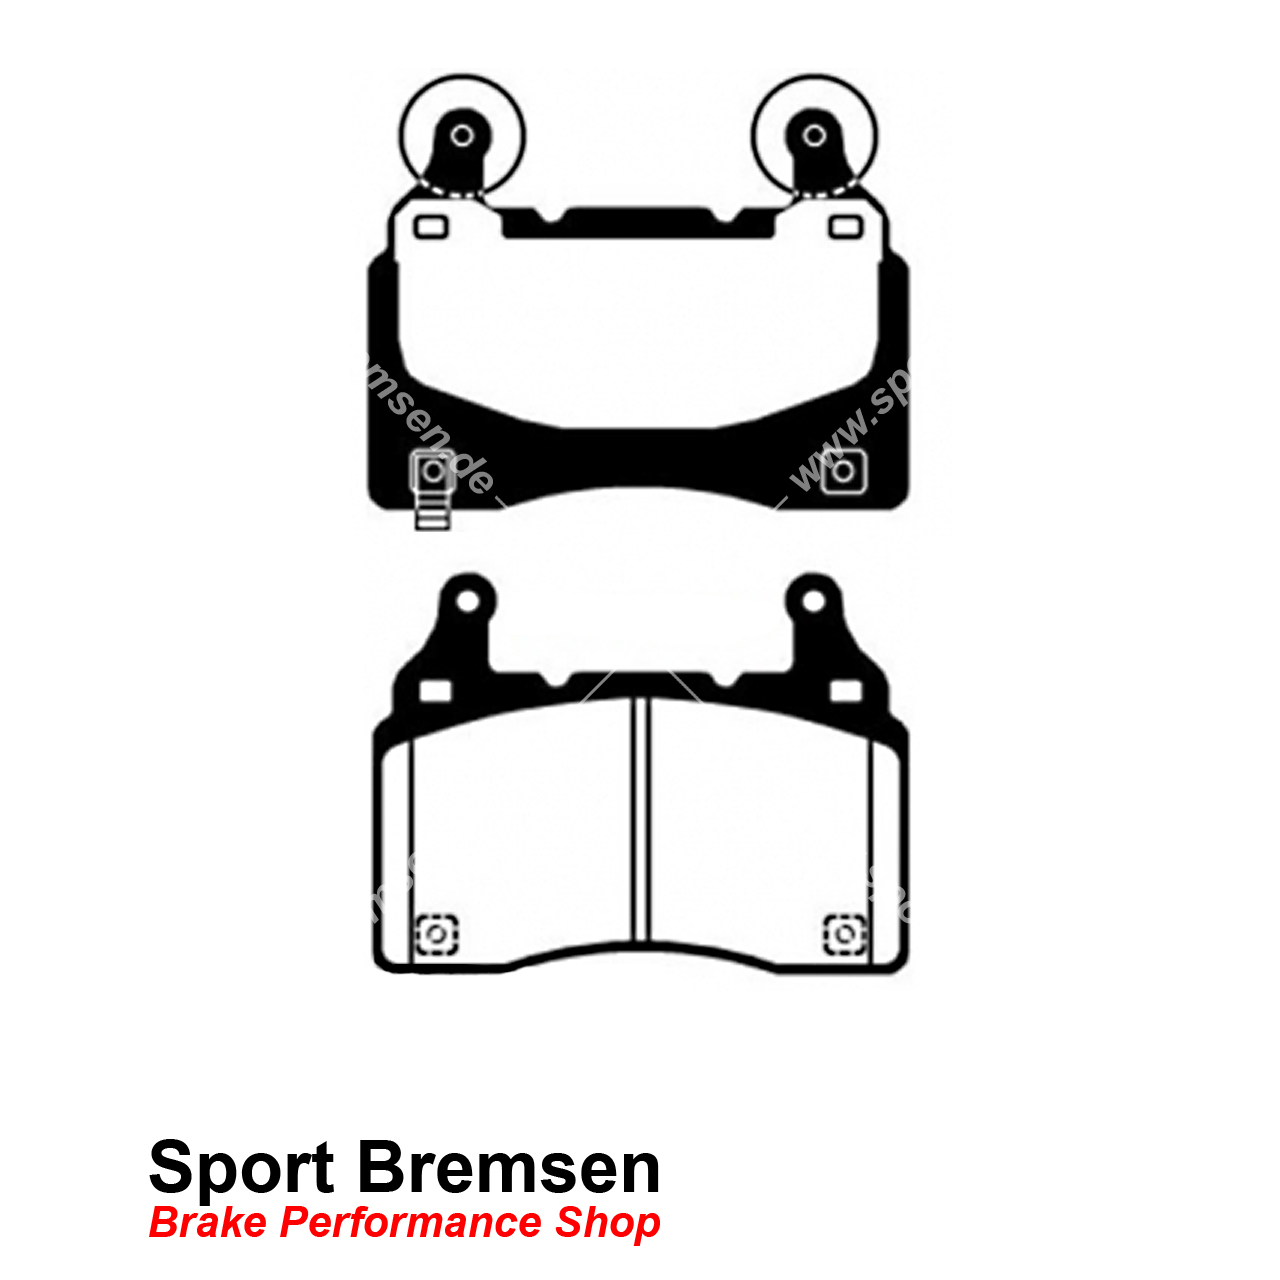 Ebc Redstuff Keramik Bremsbelage Camaro 5 6 2 V8 Dp C